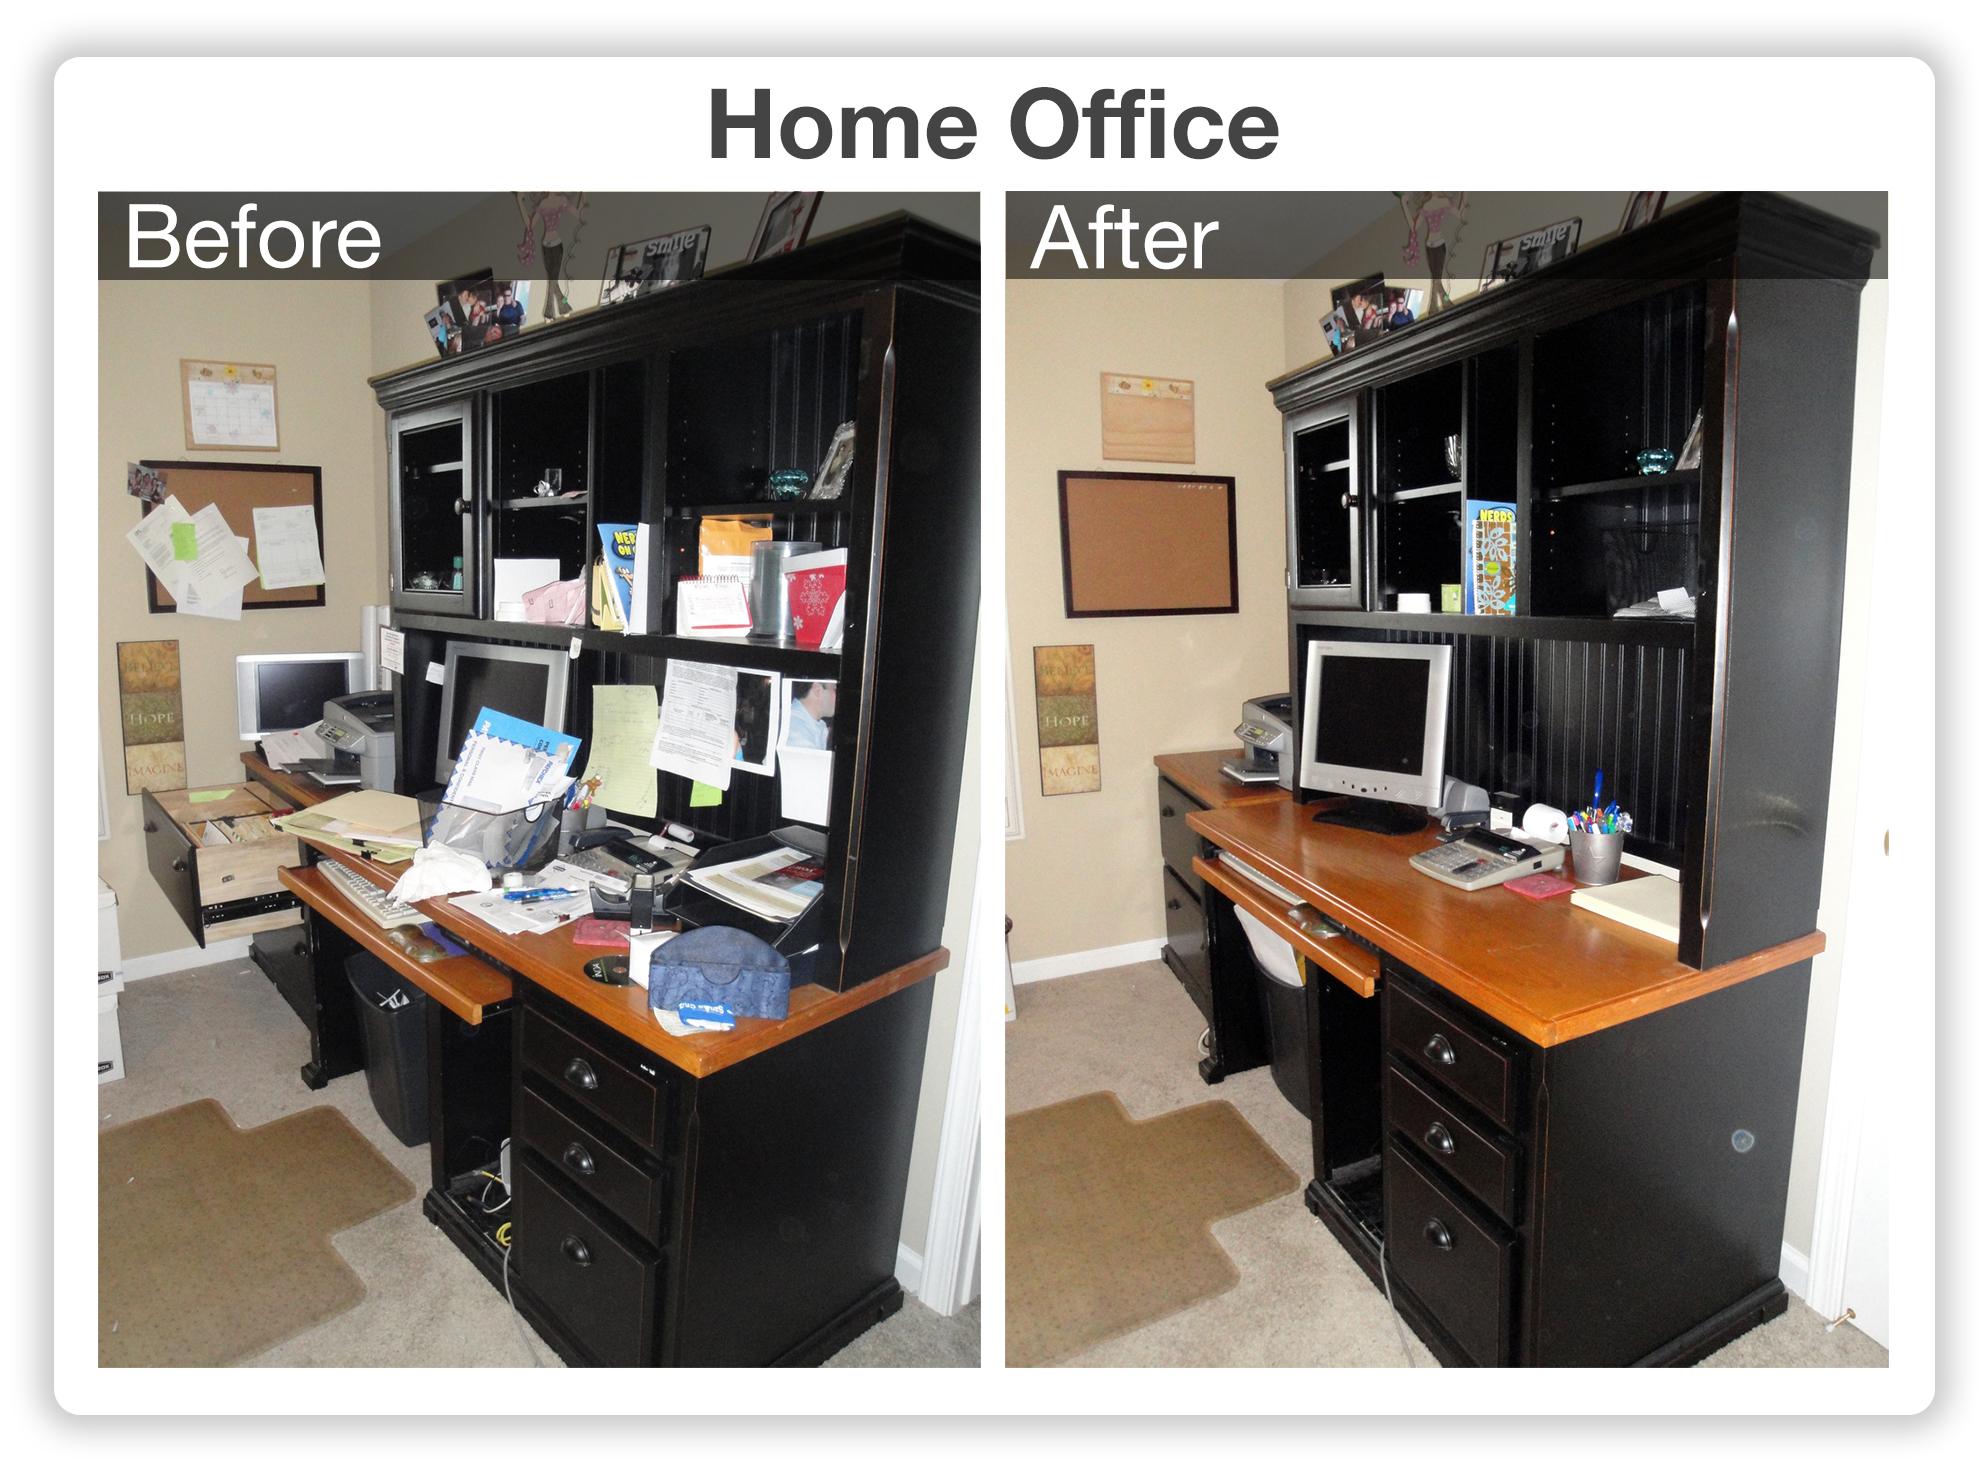 organized_by_choice_home_office_2.jpg